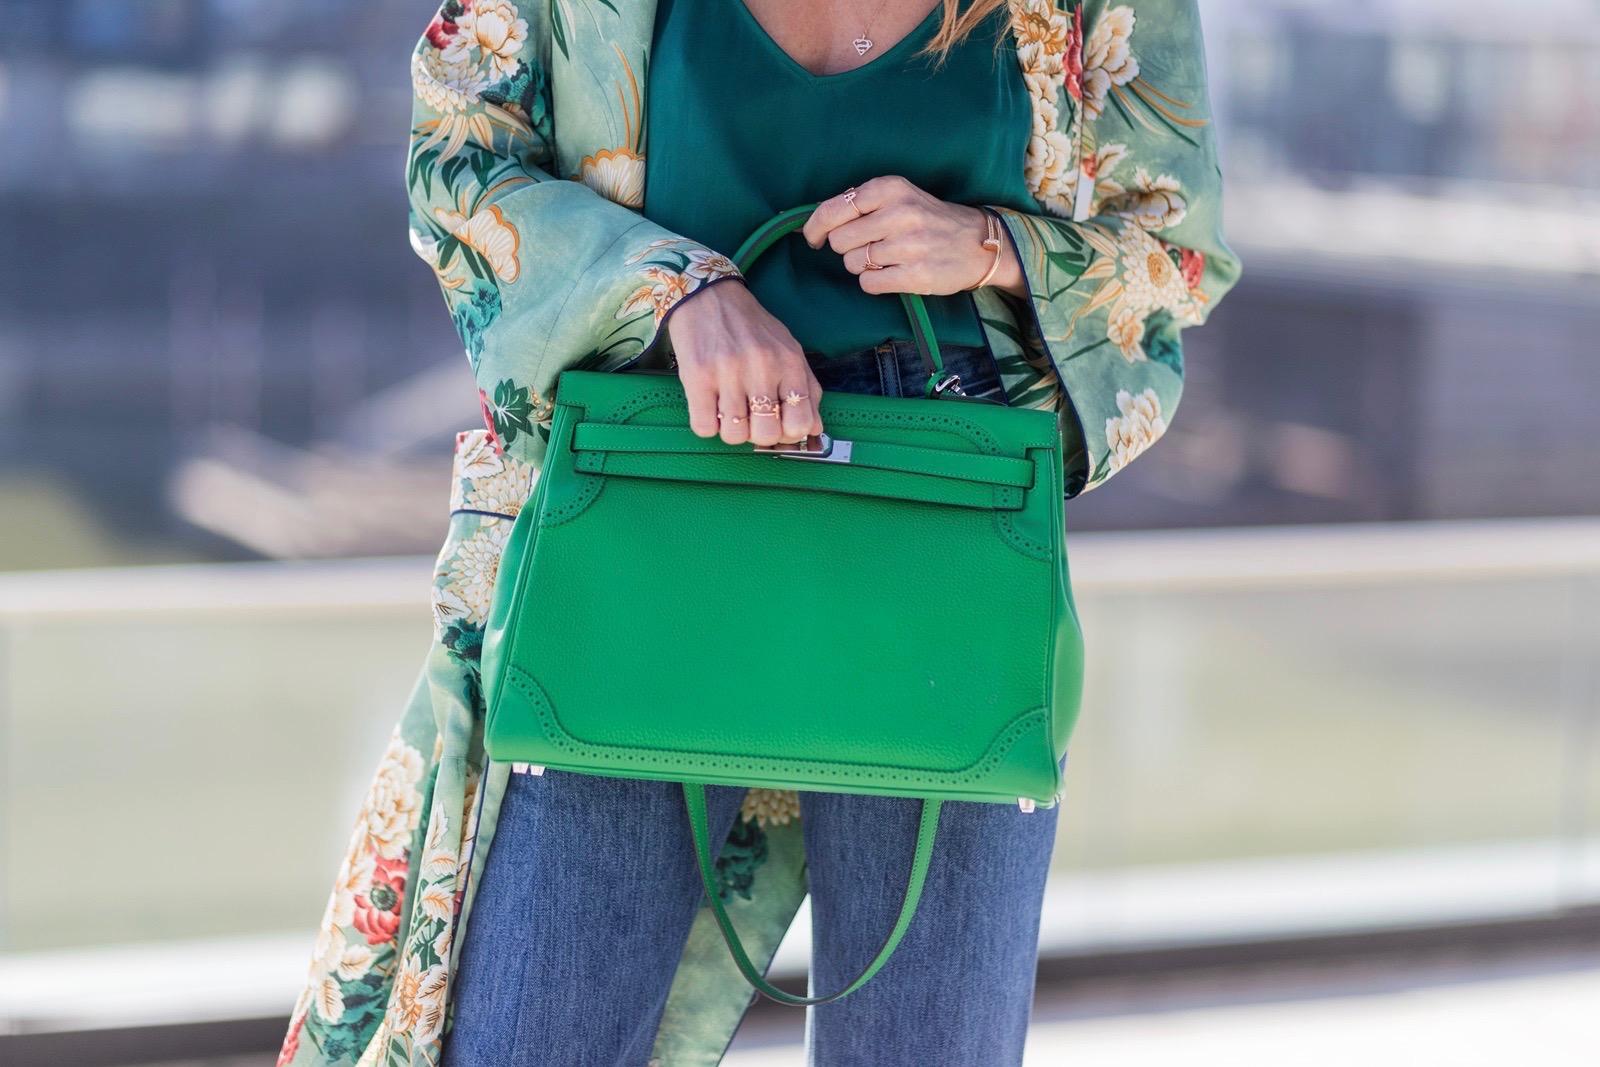 374c9ce1 ... Model and fashion blogger Alexandra Lapp has a Kimono Love, wearing a  green flower printed ...